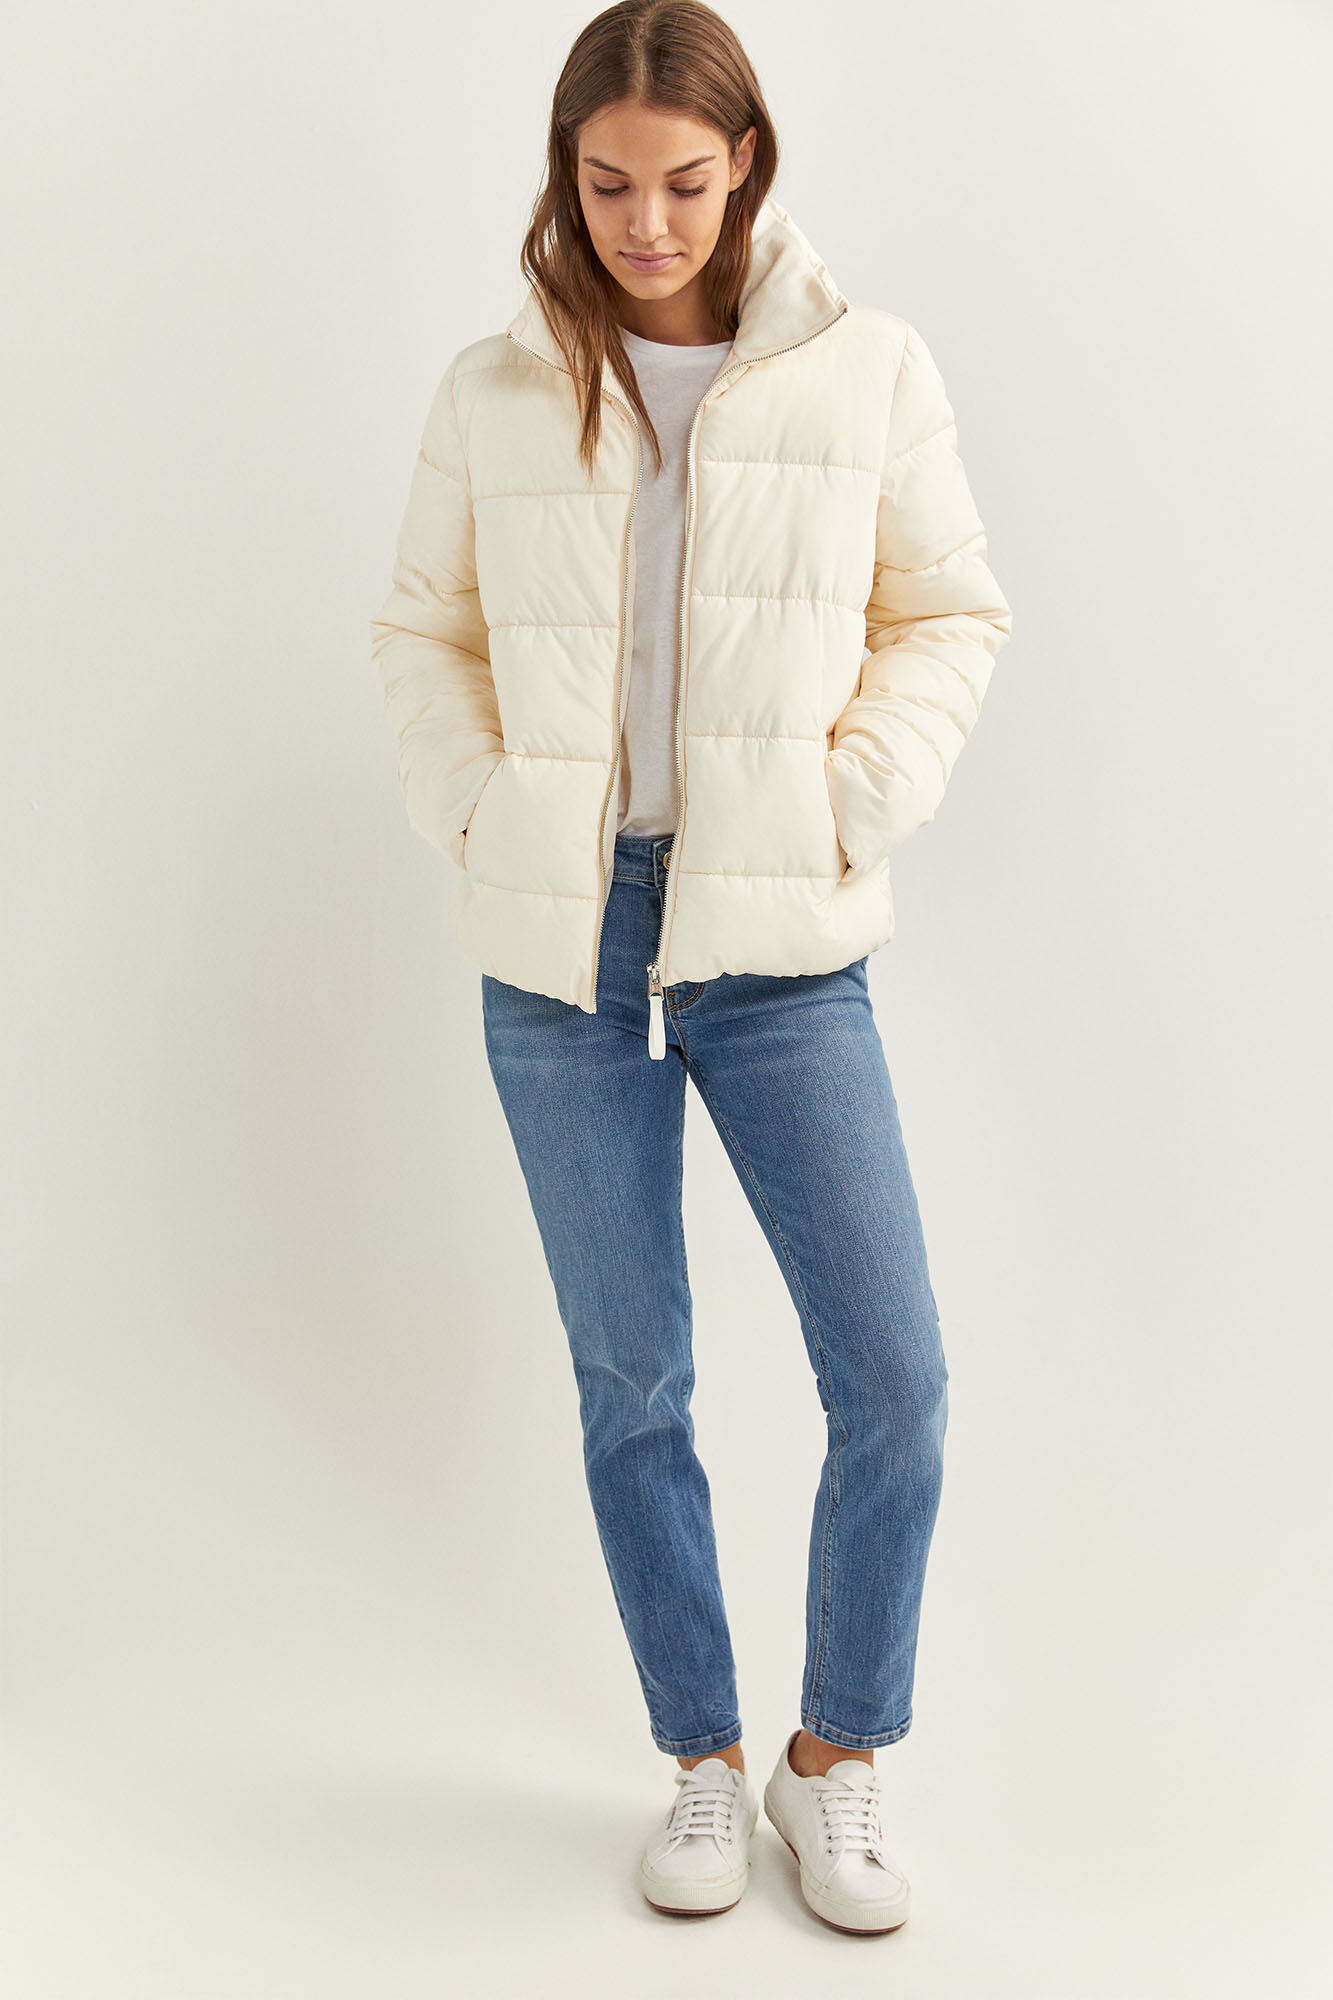 manteau springfield femme